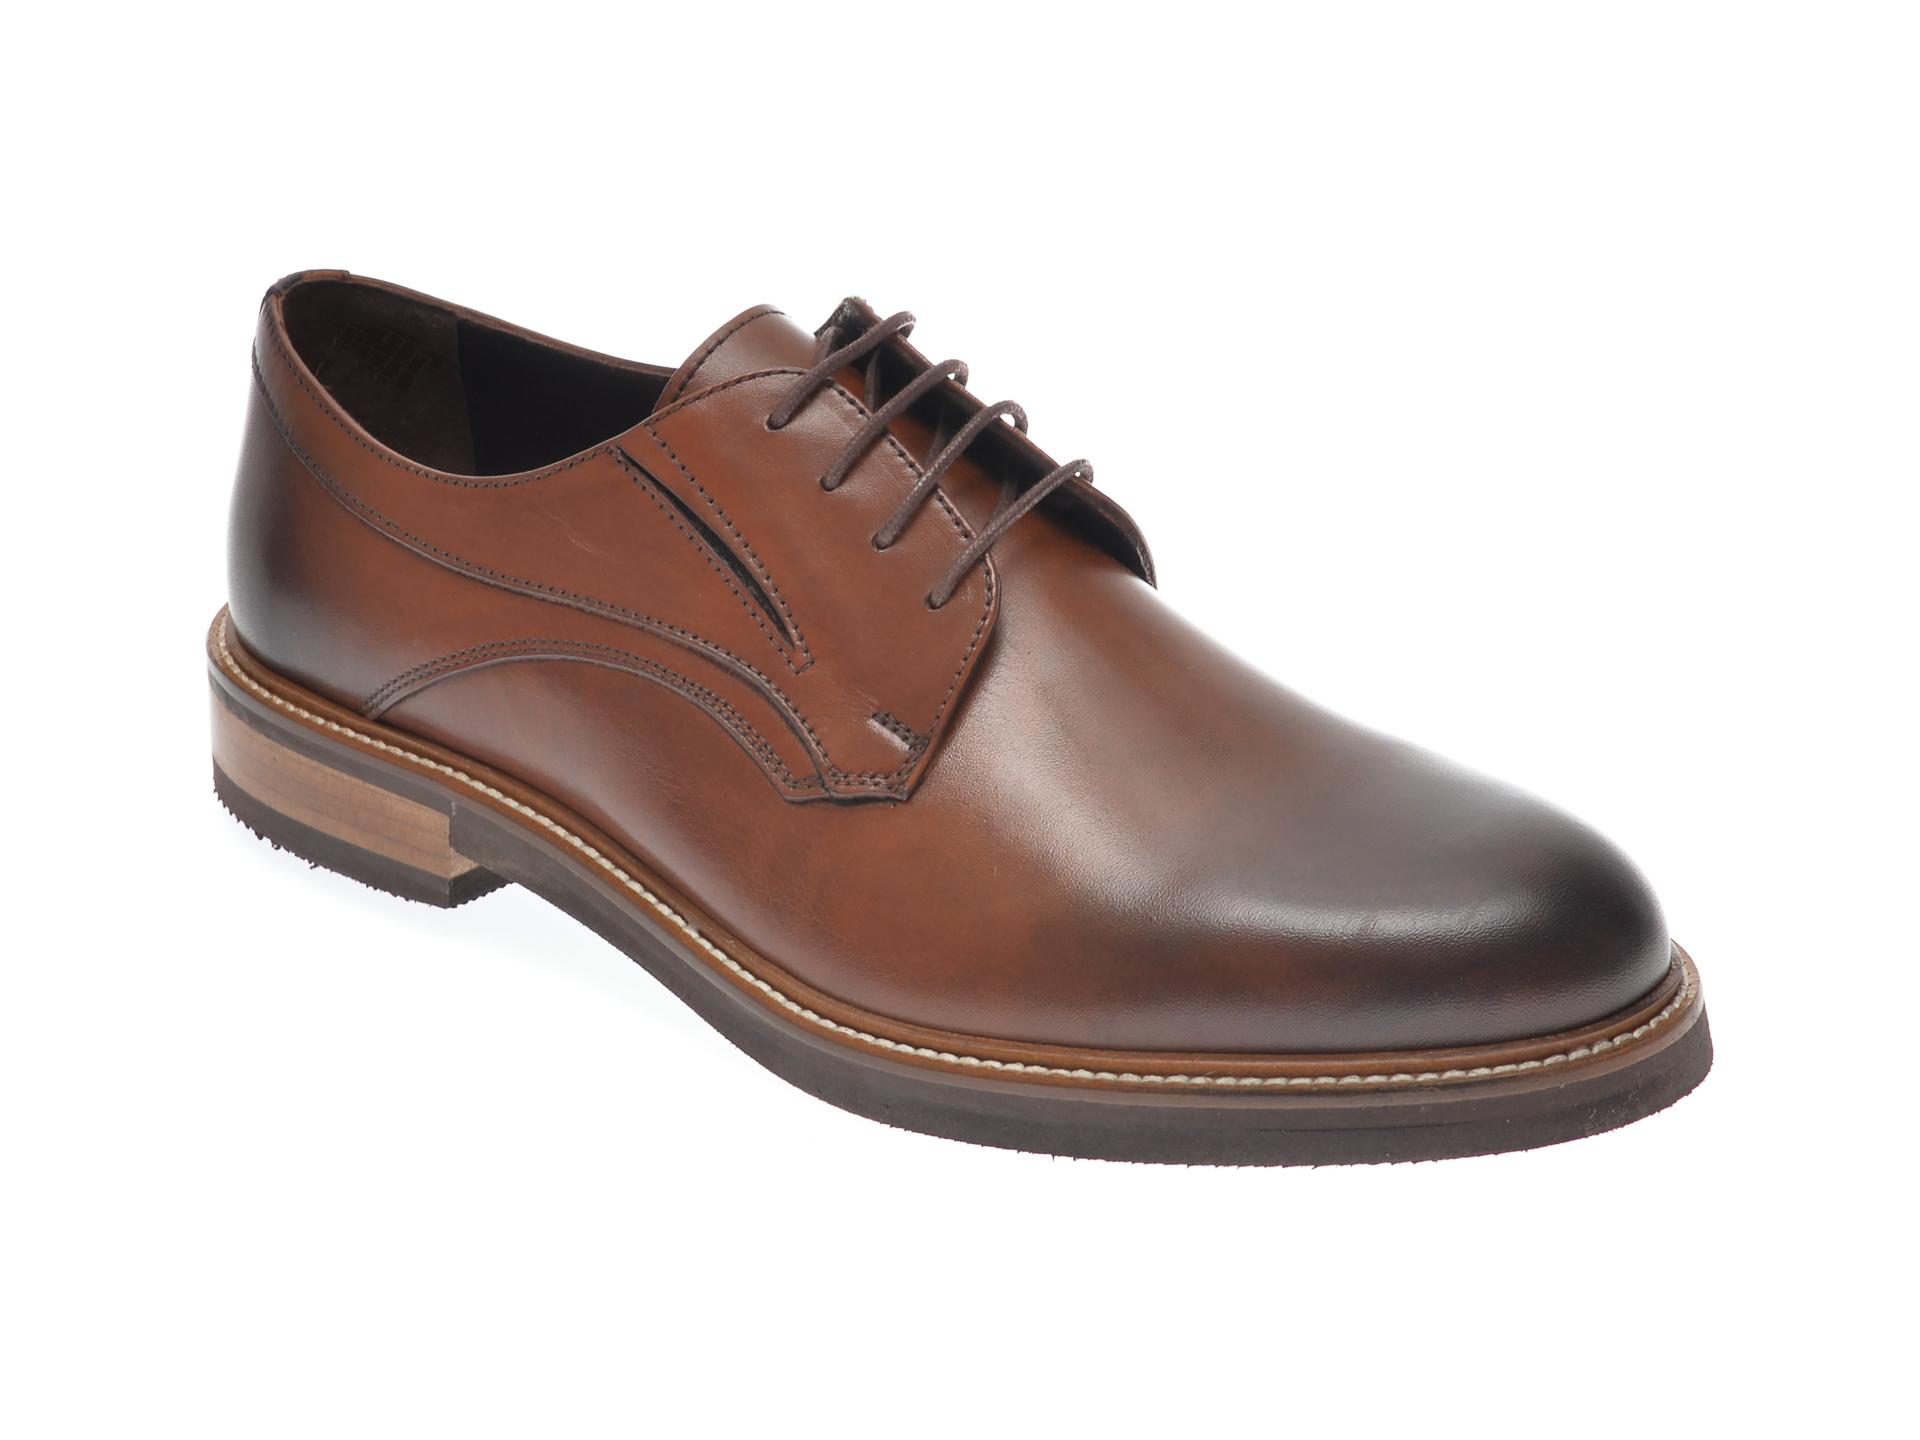 Pantofi OTTER maro, 7841, din piele naturala imagine